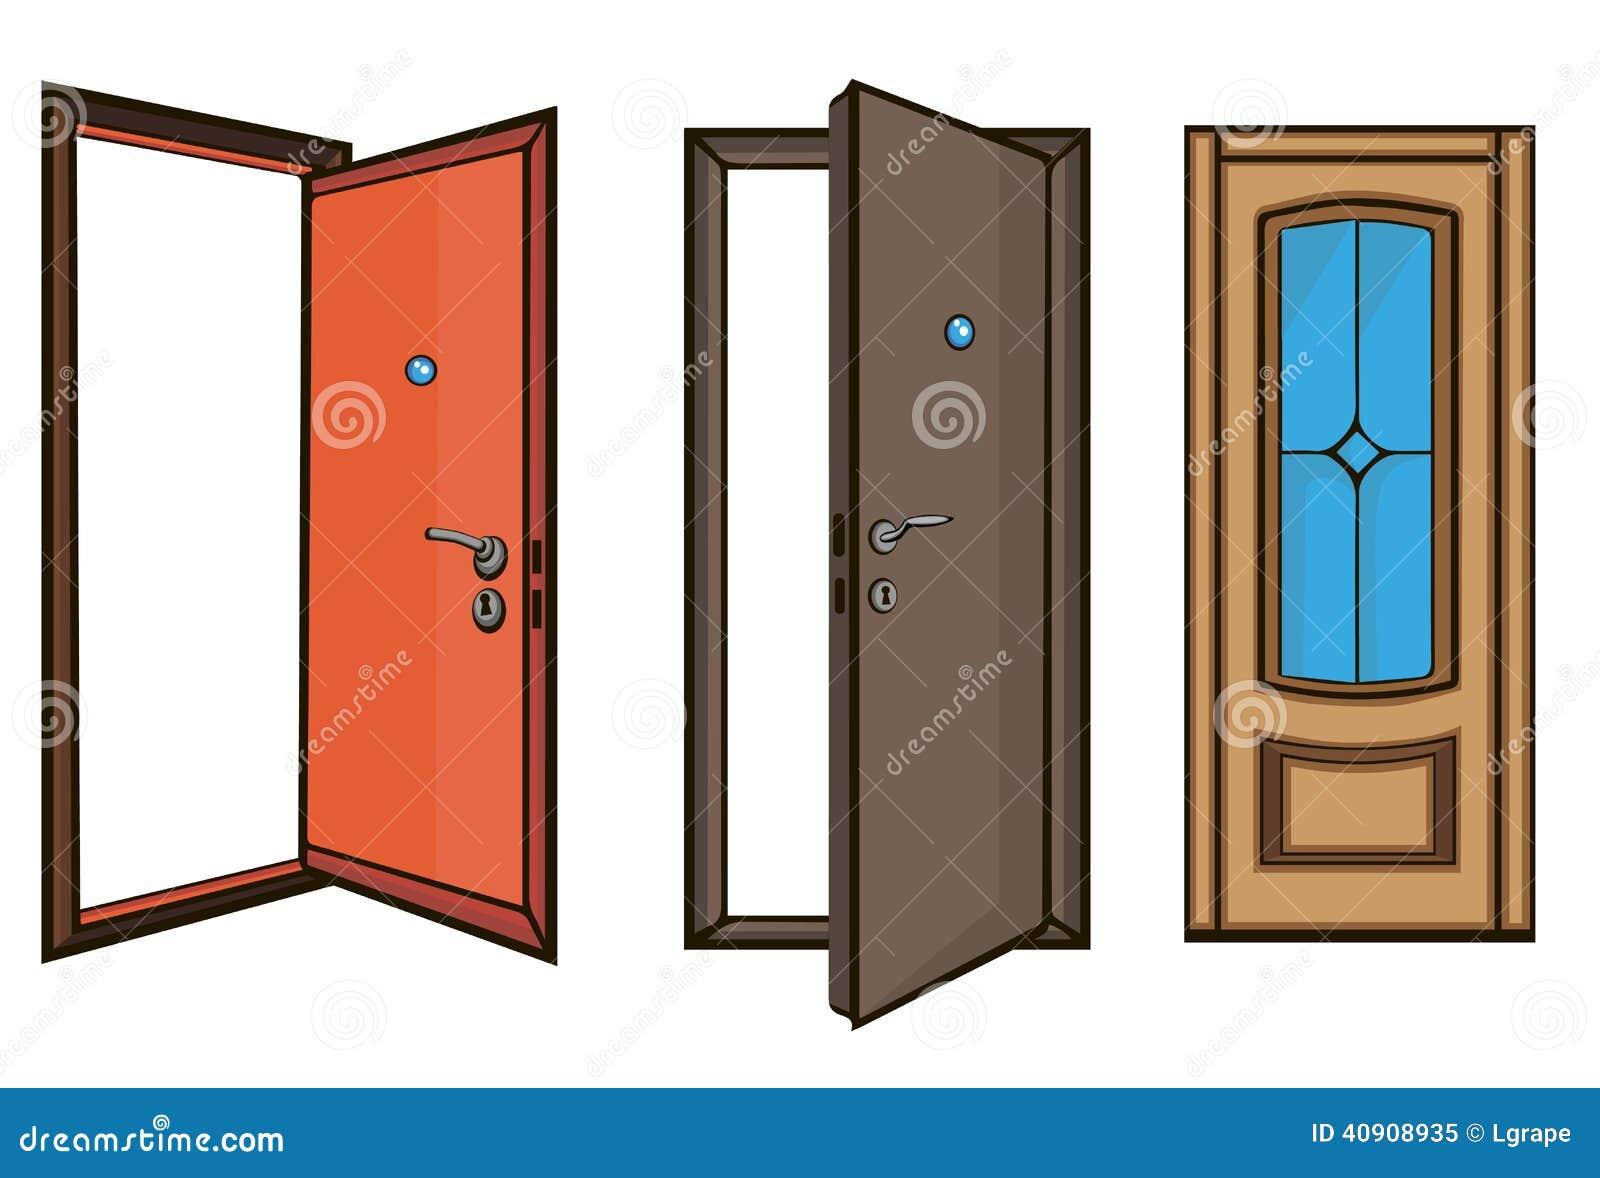 animation of swinging doors